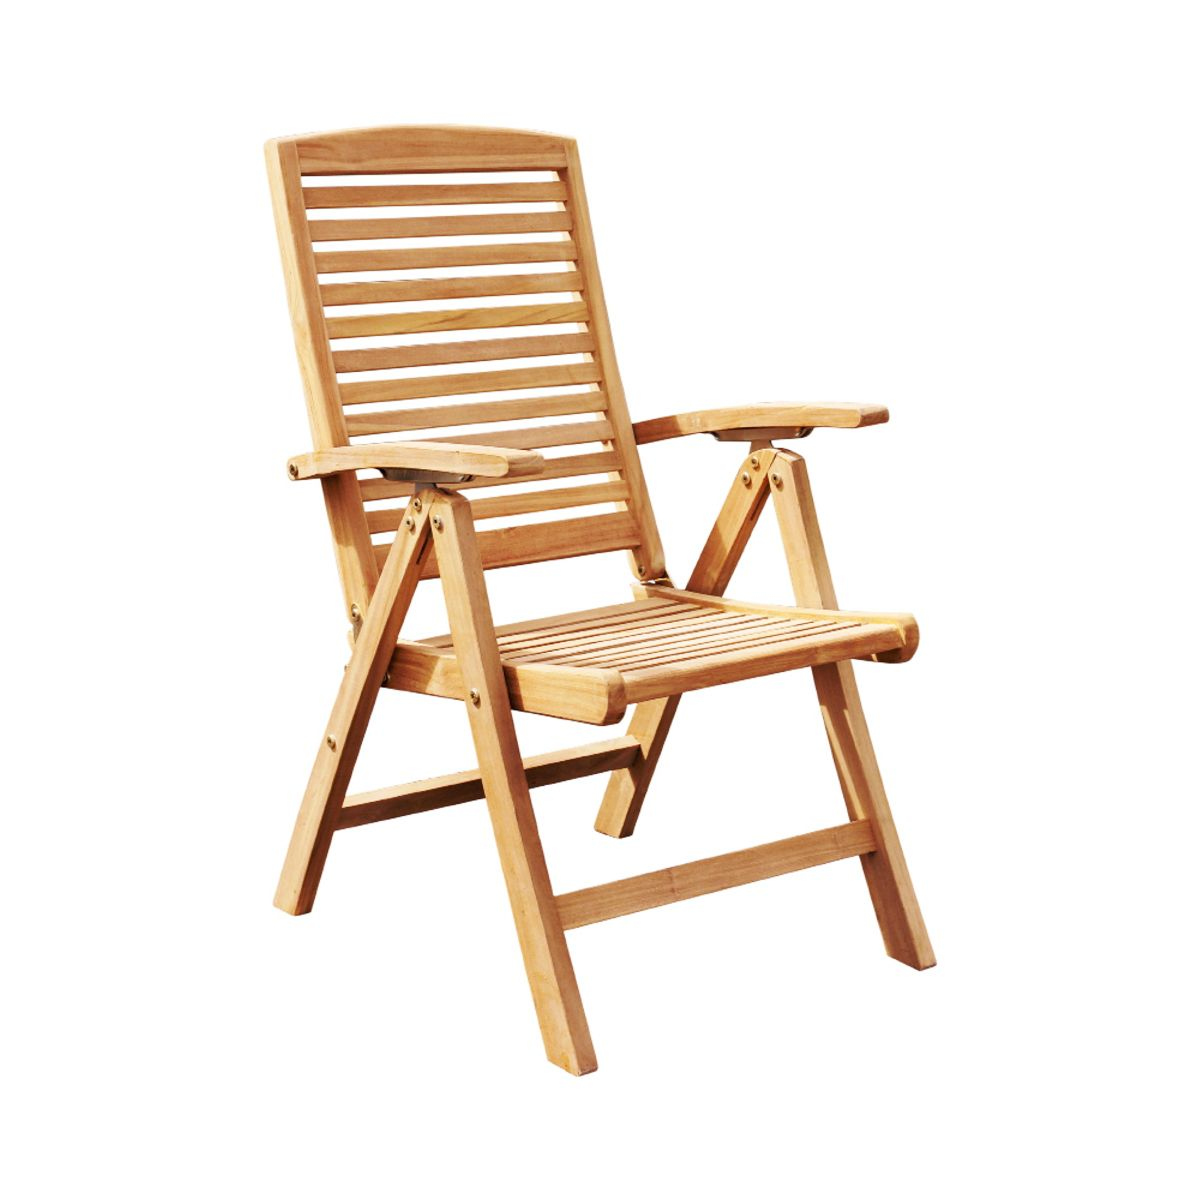 Garden Outdoor Chair, made of solid teak wood. Indonesia ...